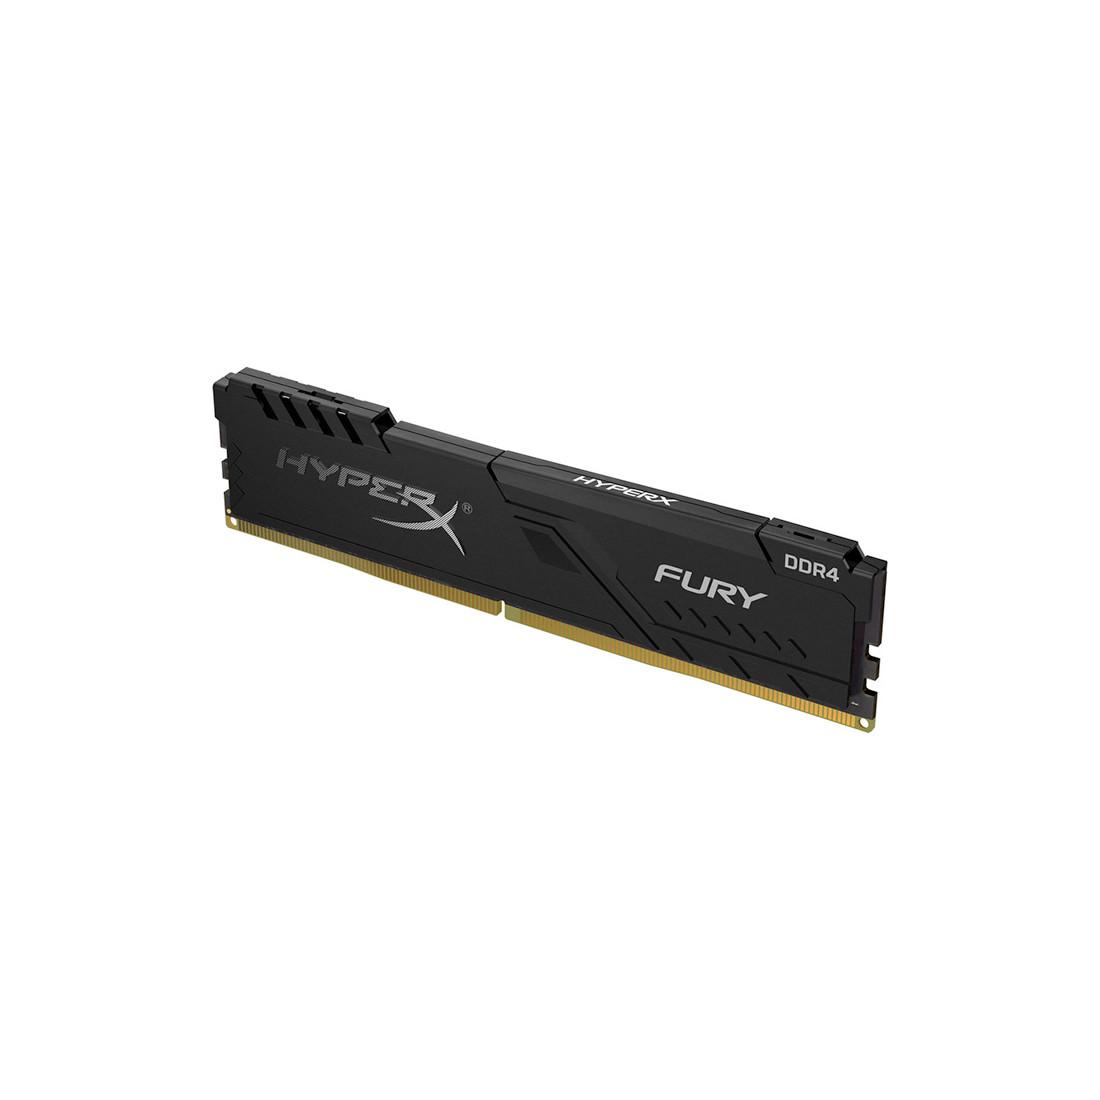 Модуль памяти Kingston HyperX Fury HX426C16FB3/8 (DDR4, 8GB, DIMM)